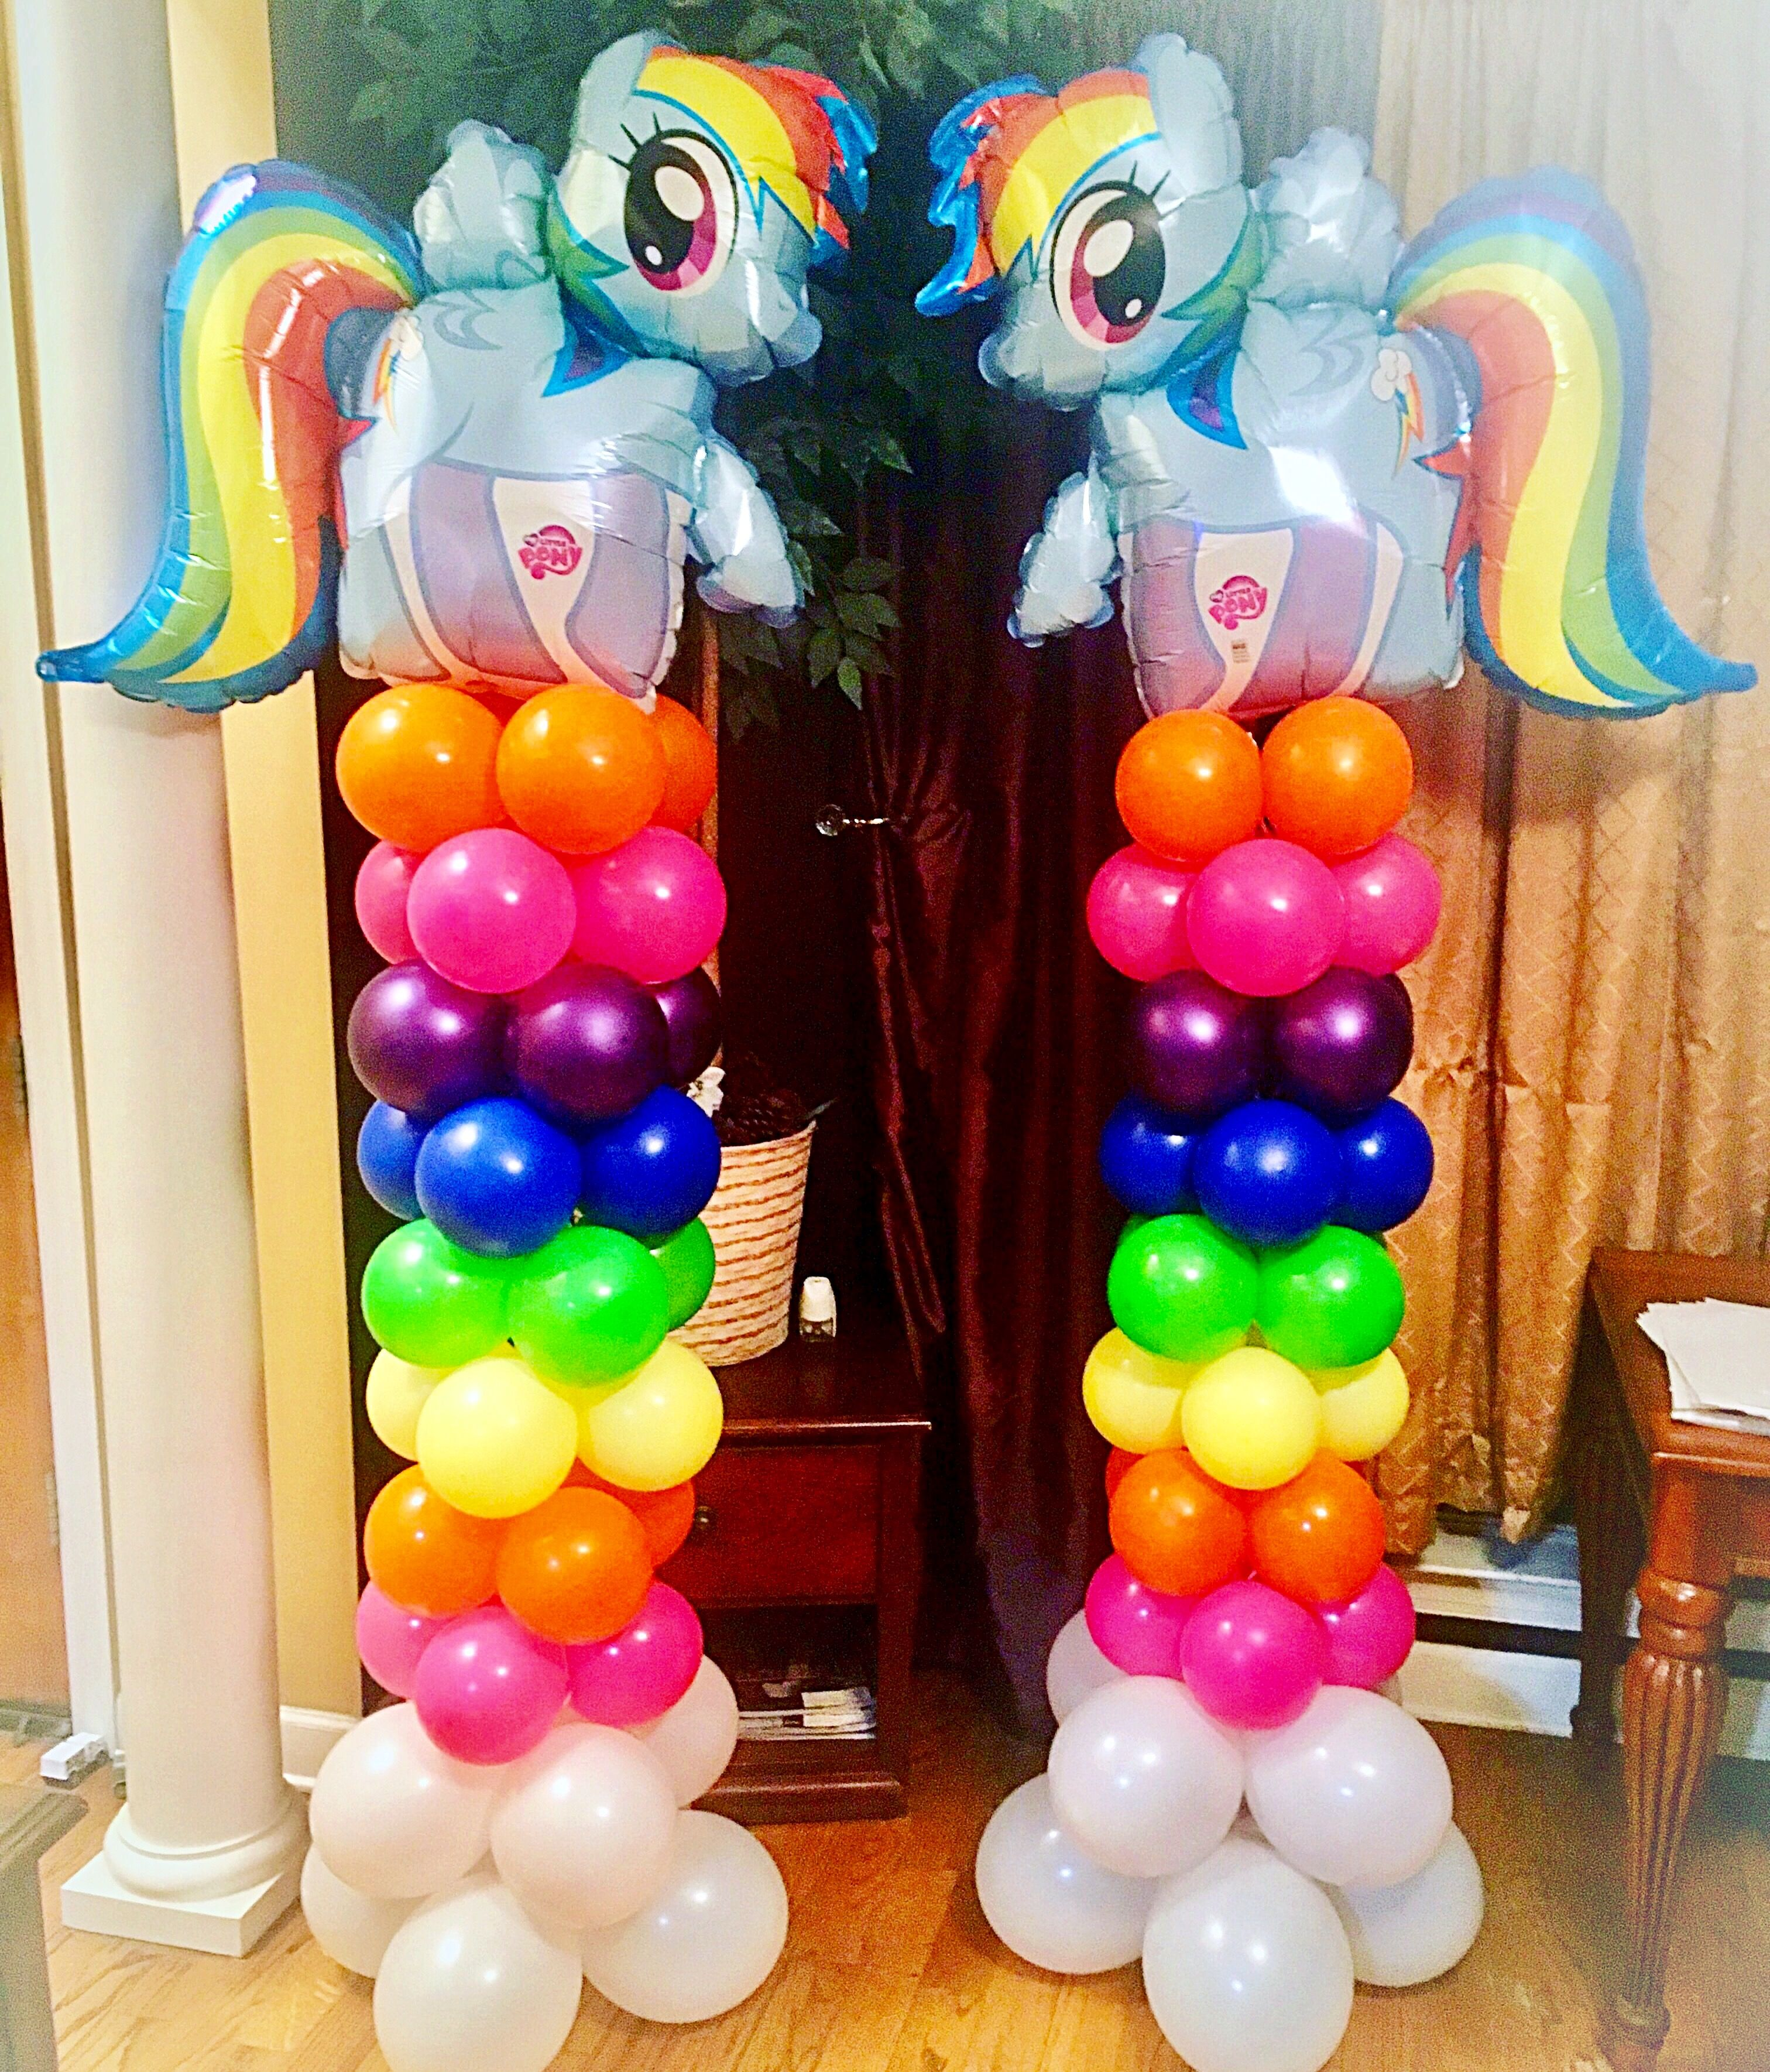 My Little Pony Balloon Columns My Little Pony Birthday My Little Pony Birthday Party My Little Pony Decorations